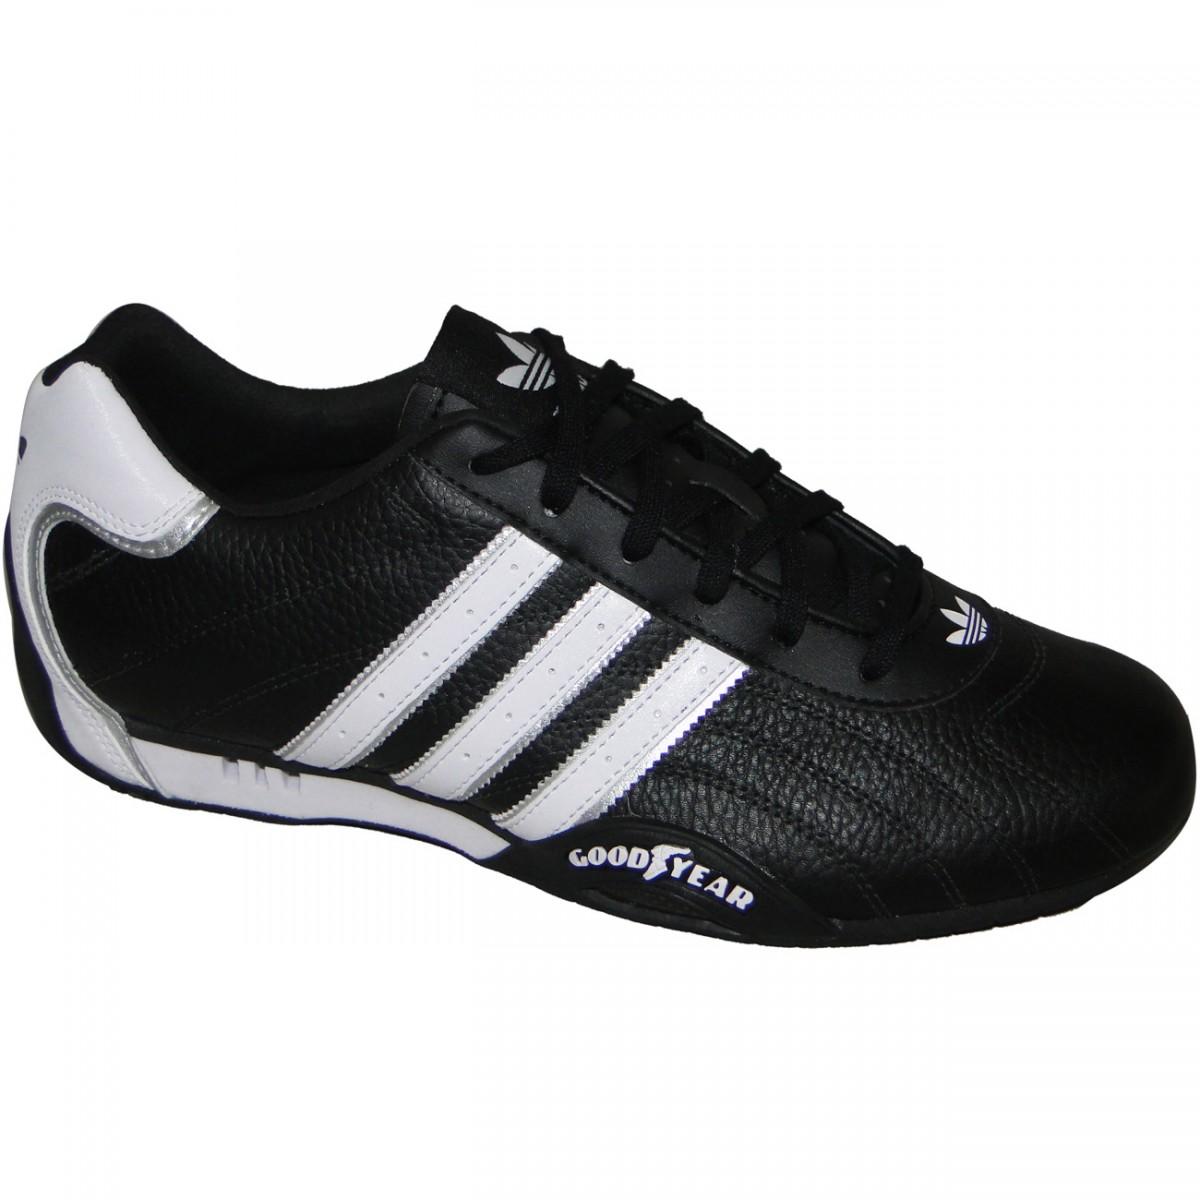 96d3ce4ef Adidas Goodyear Pas Cher;